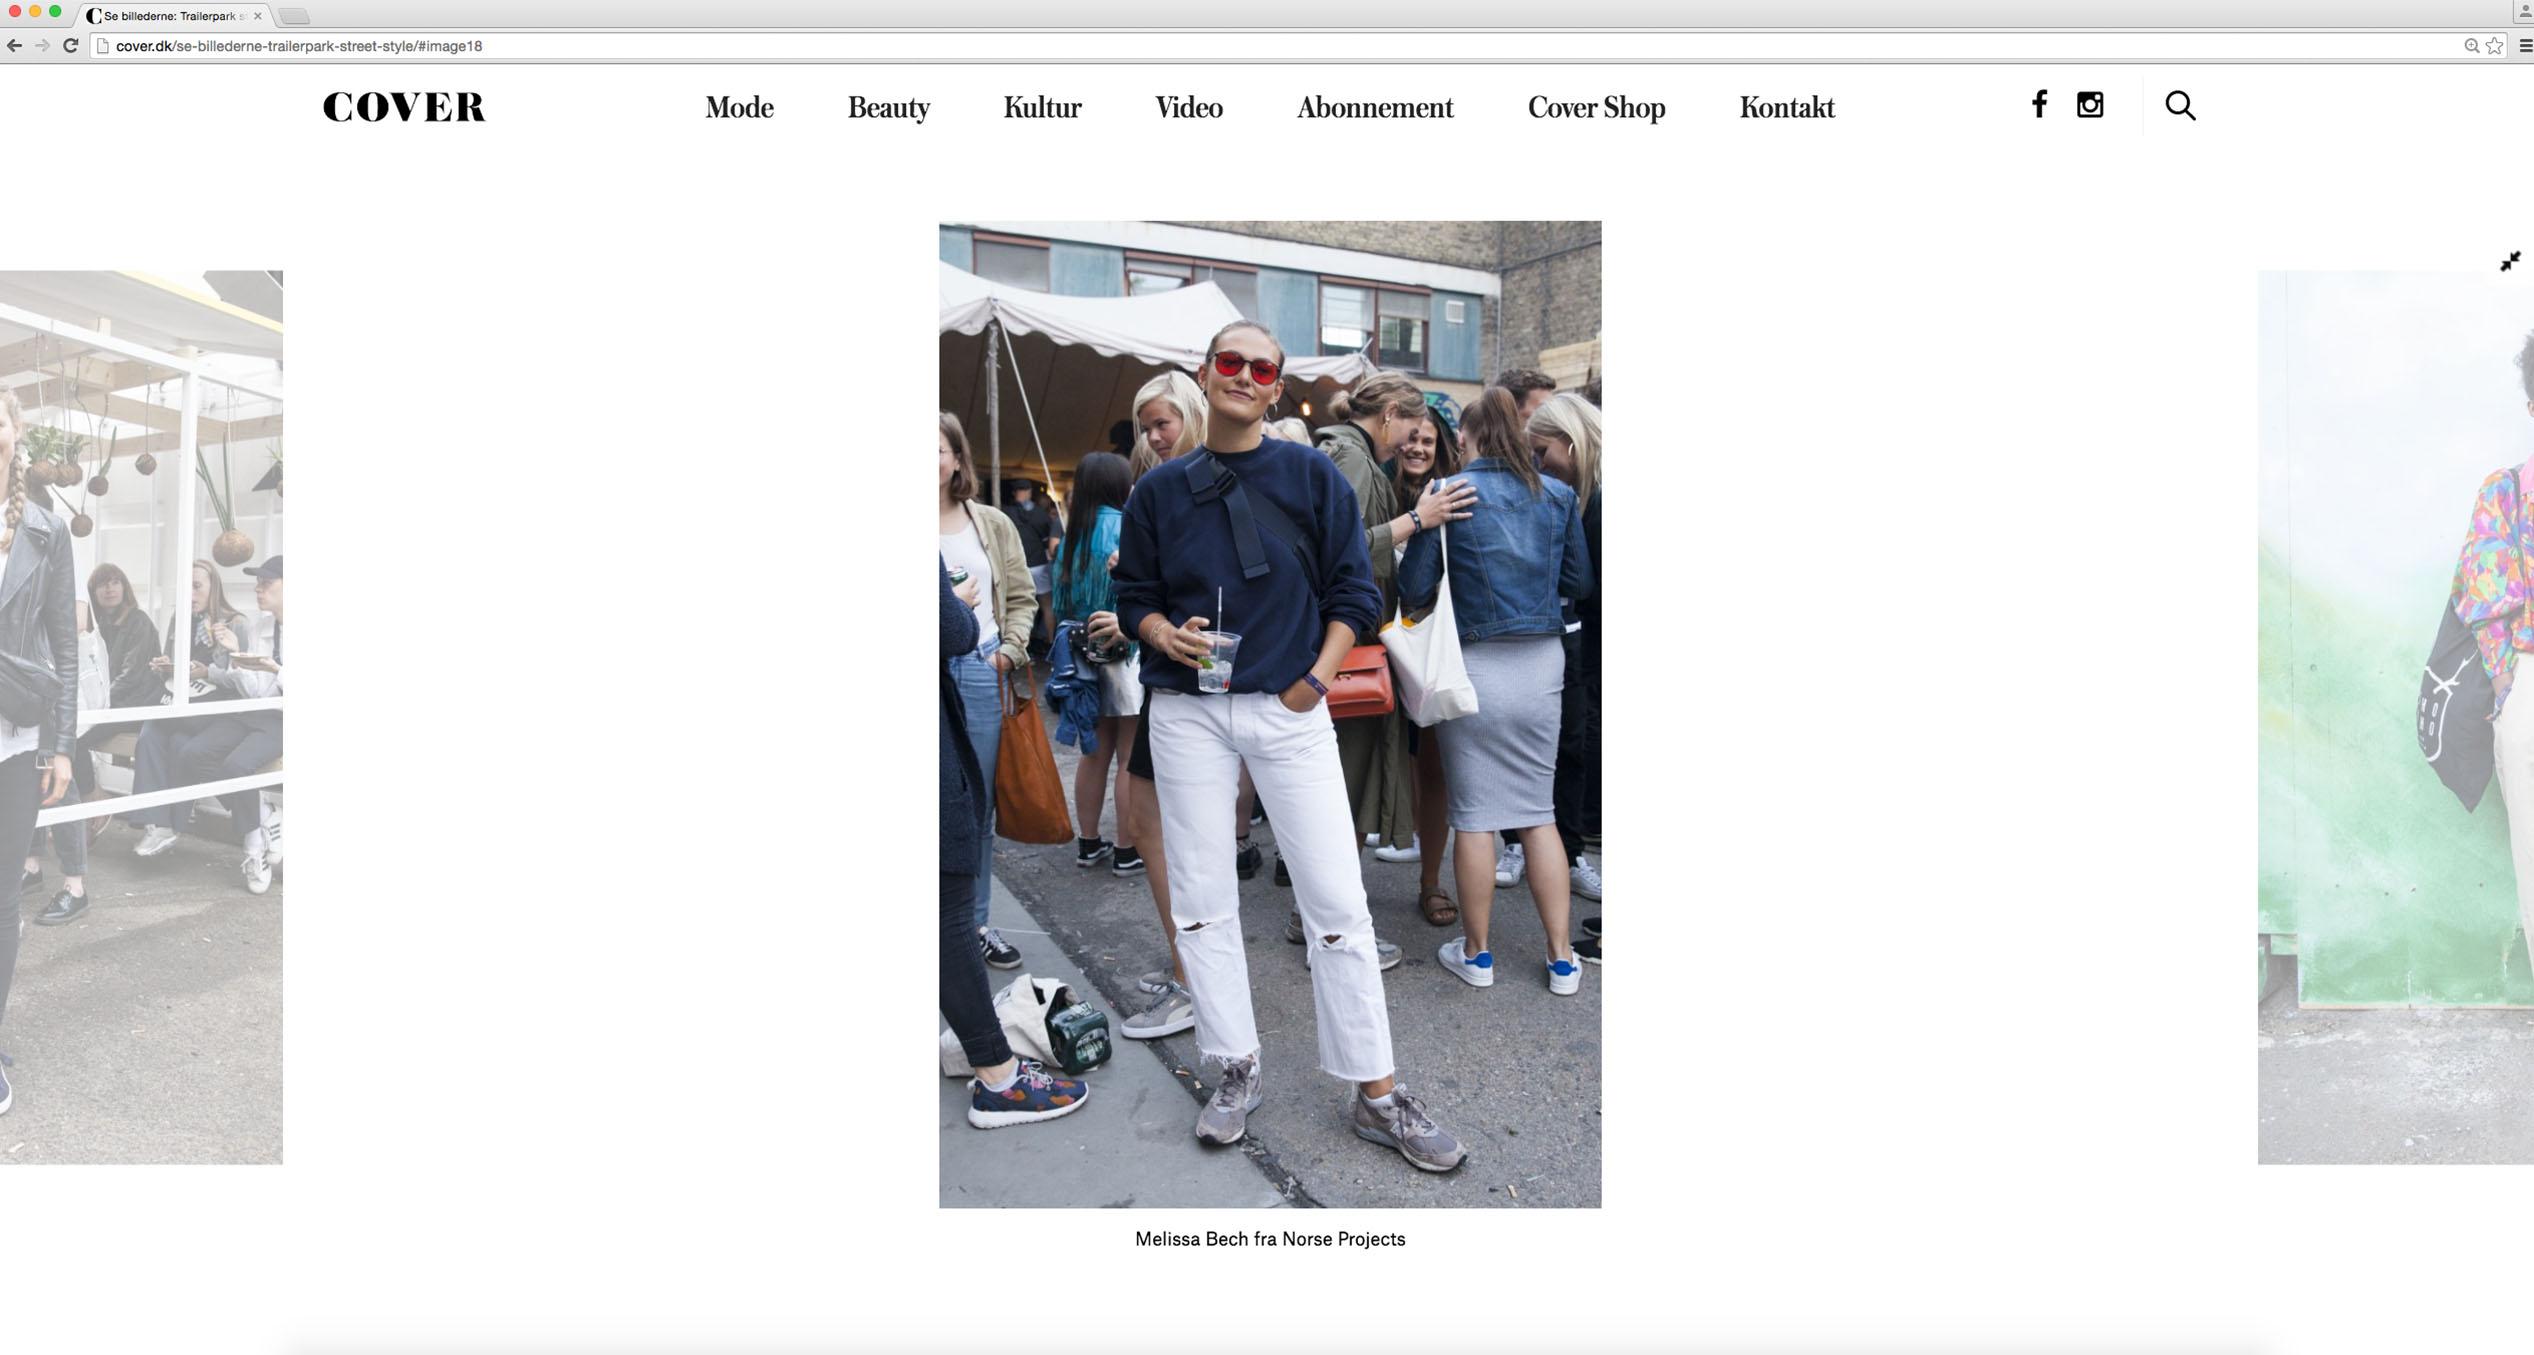 Streetstyle_CoverMagazine_TrailerparkFestival2016_18